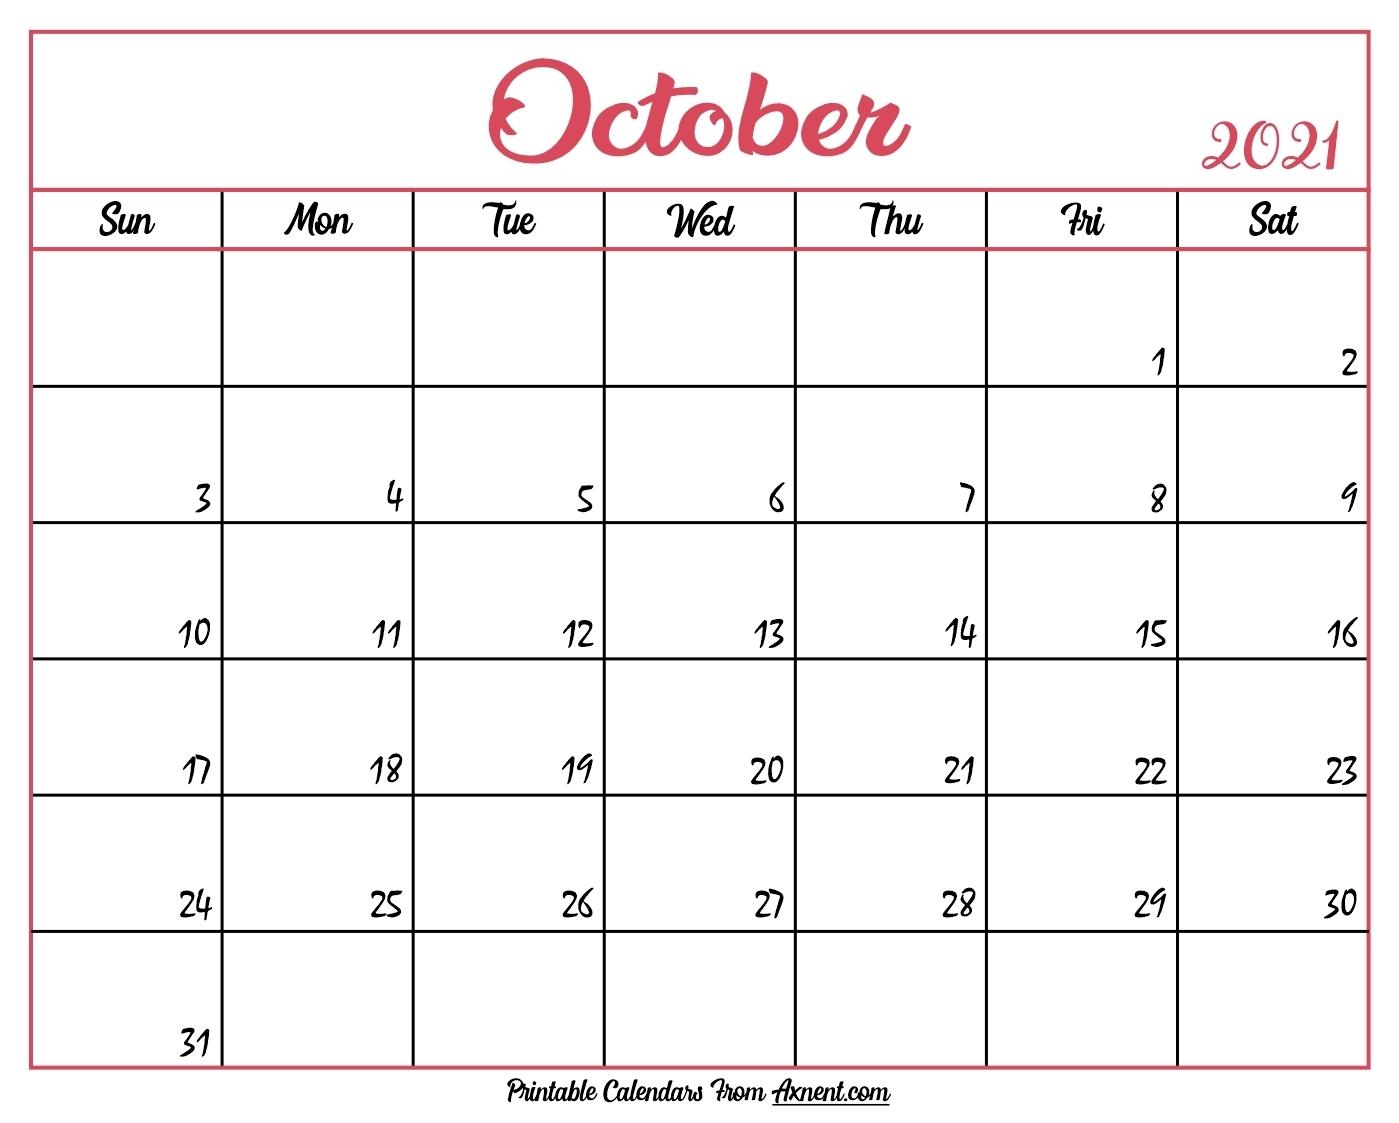 Printable October 2021 Calendar Template - Time Management